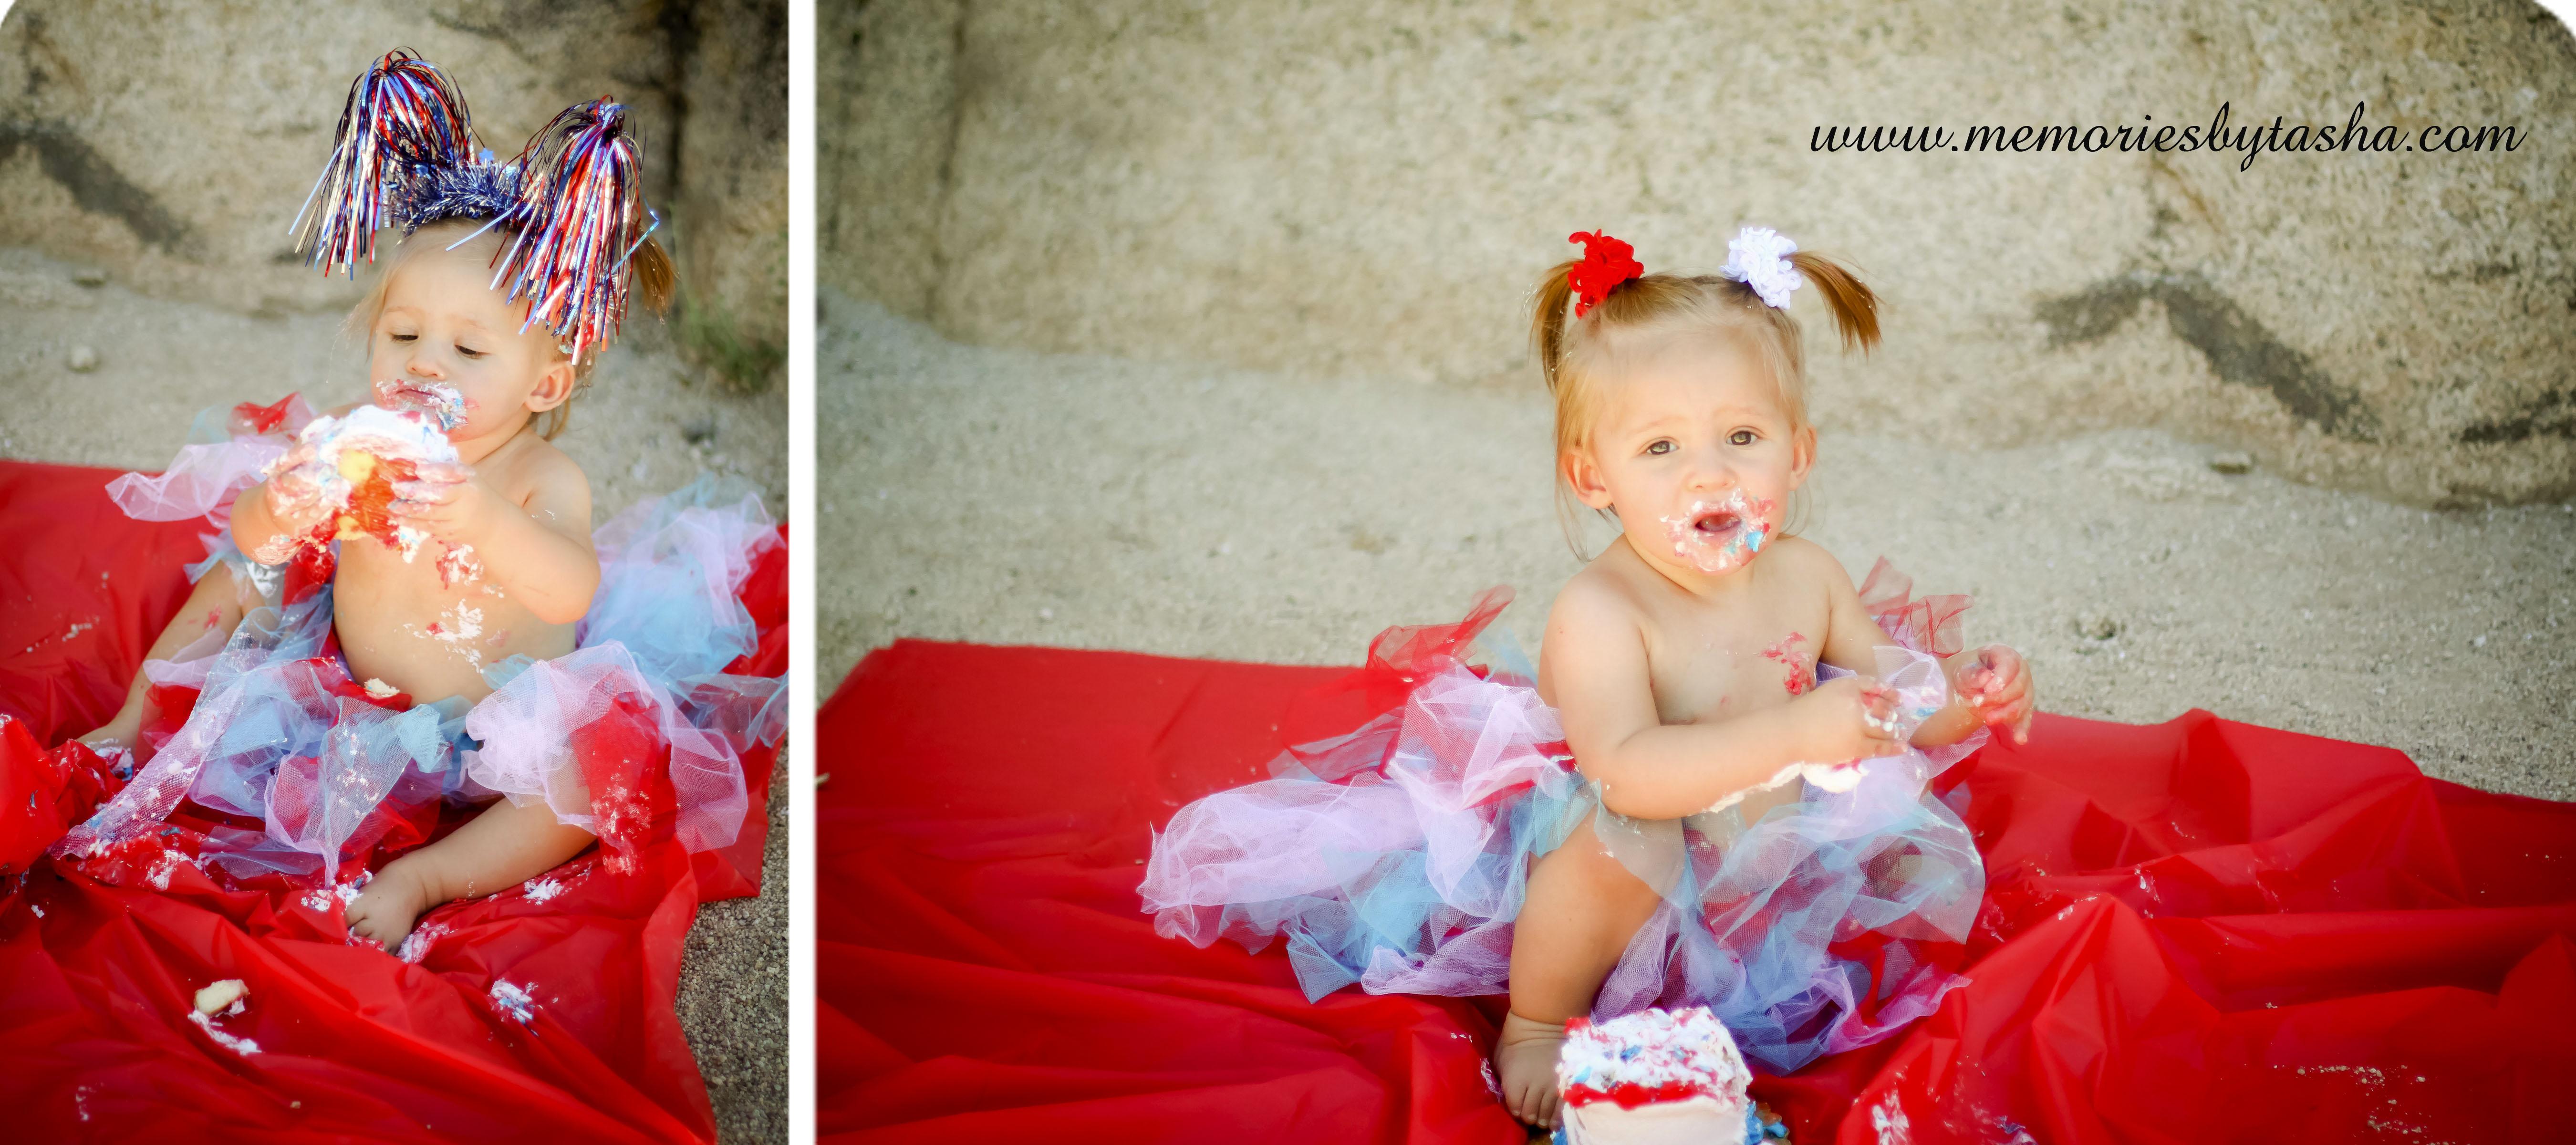 Twentynine Palms Photographer - Couples Photography - Family Photography - Children's Photography - Cake Smash-03